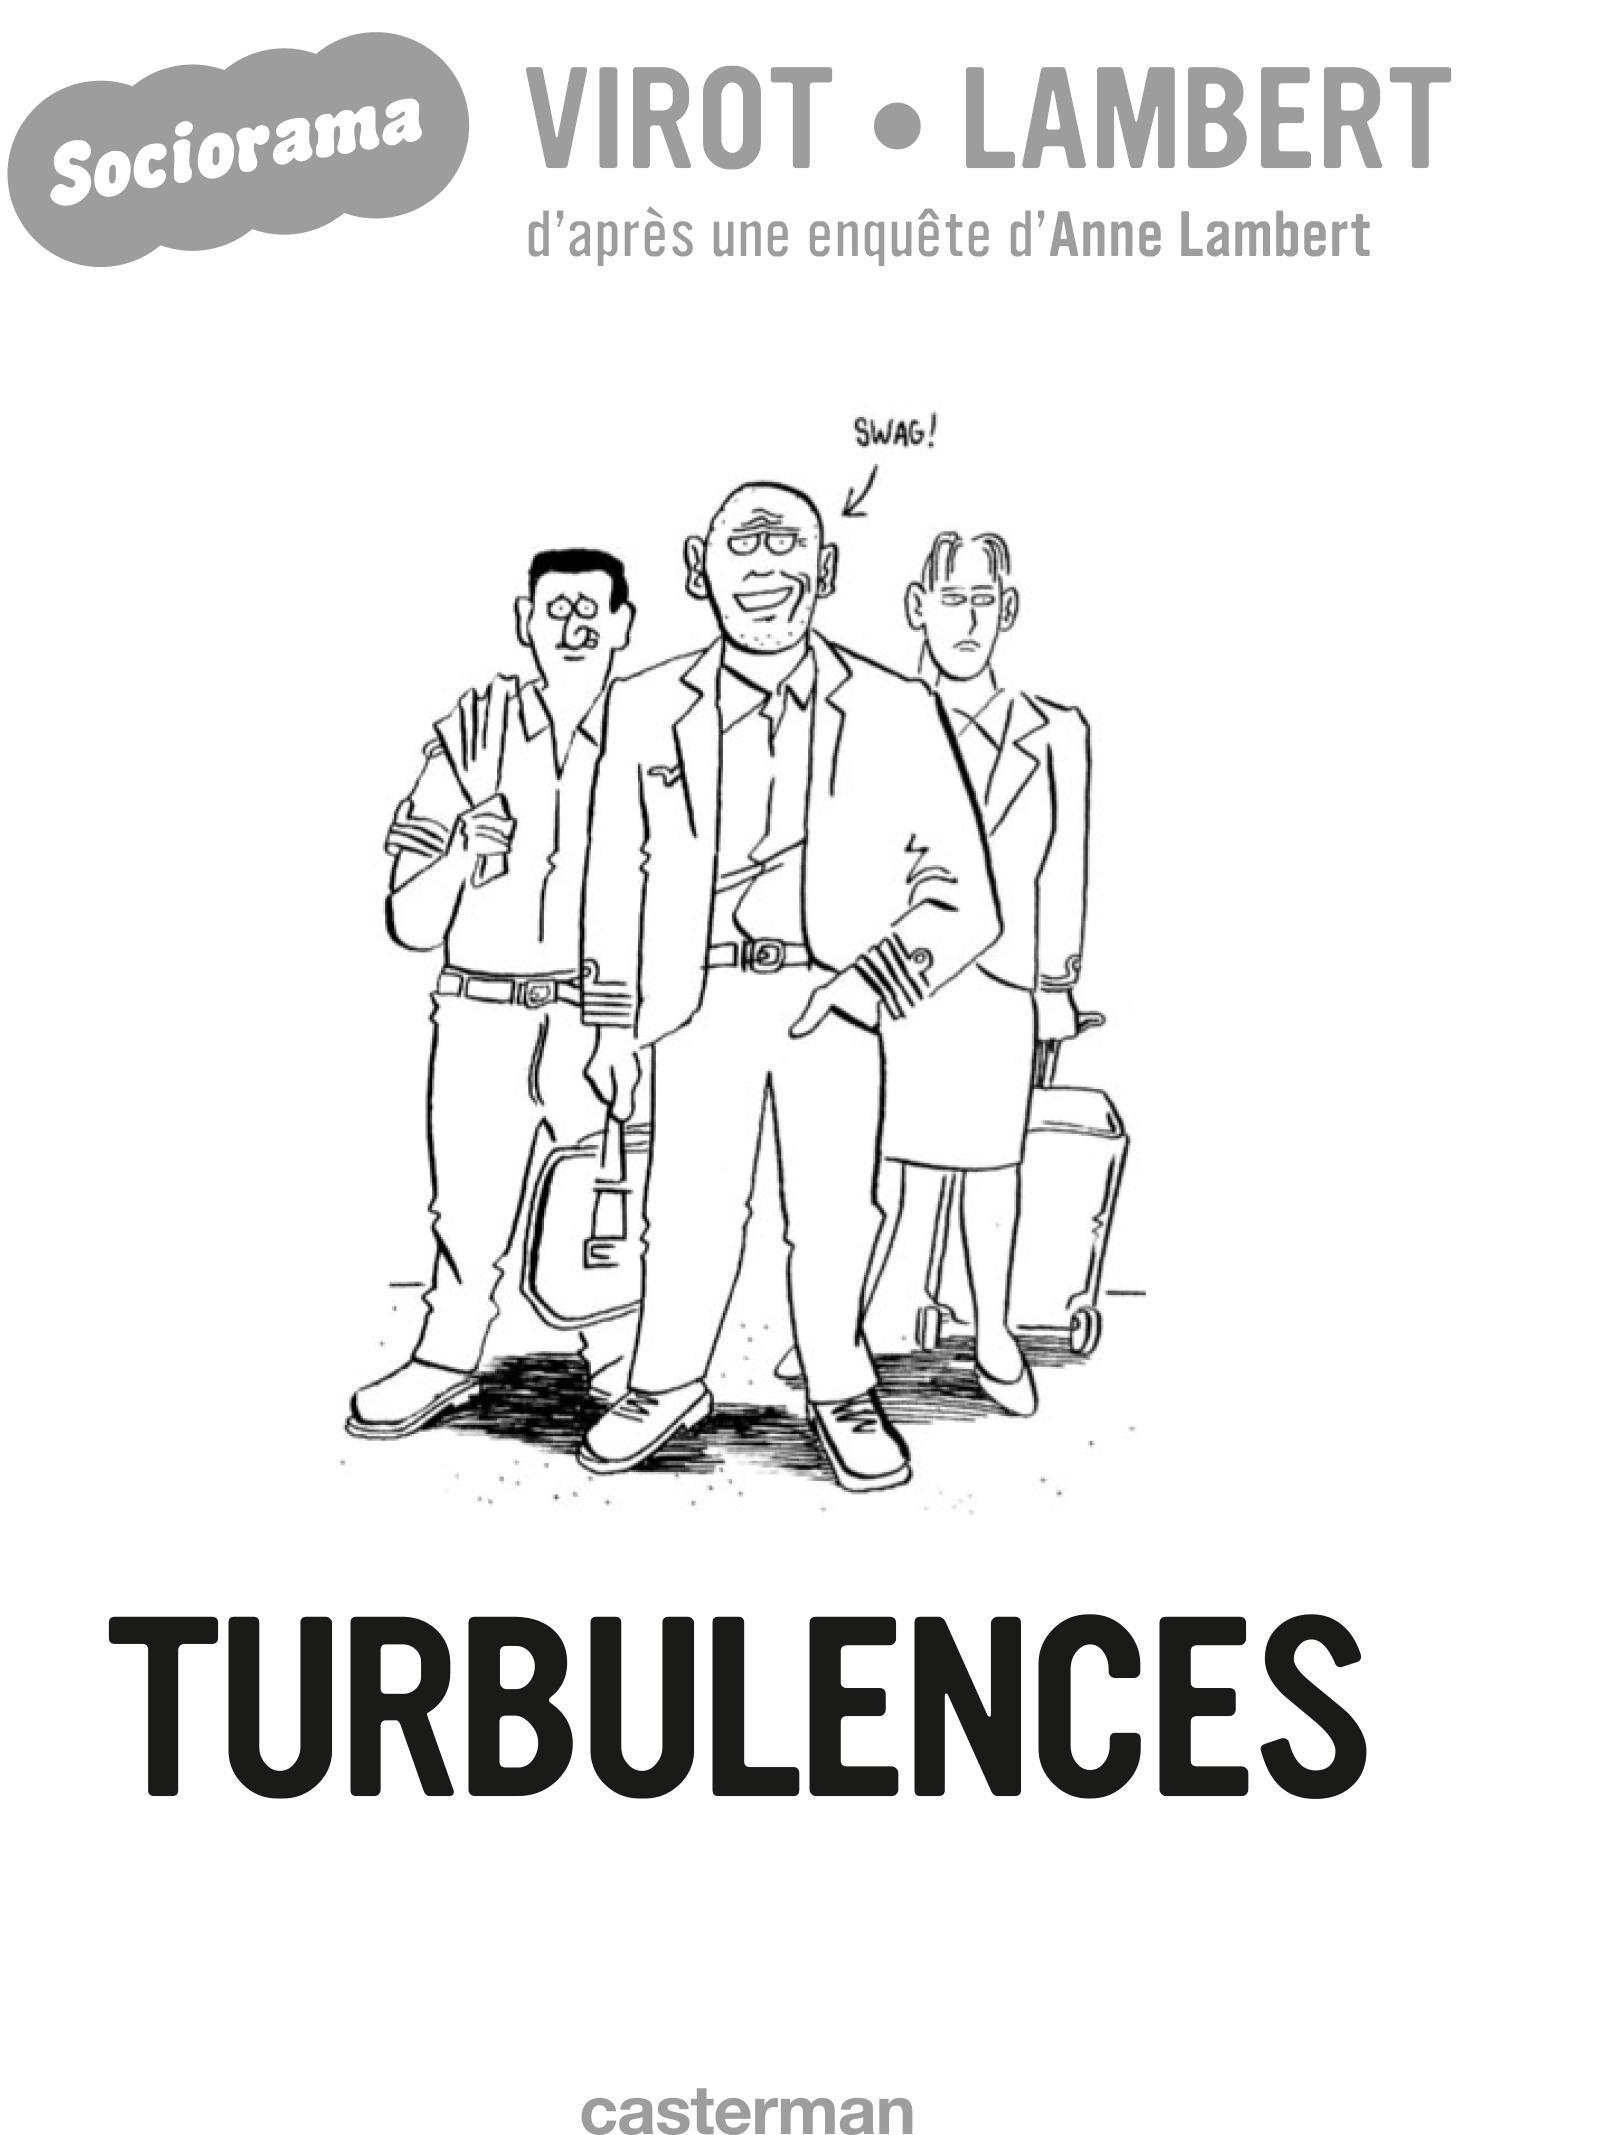 Sociorama_Turbulences_p0